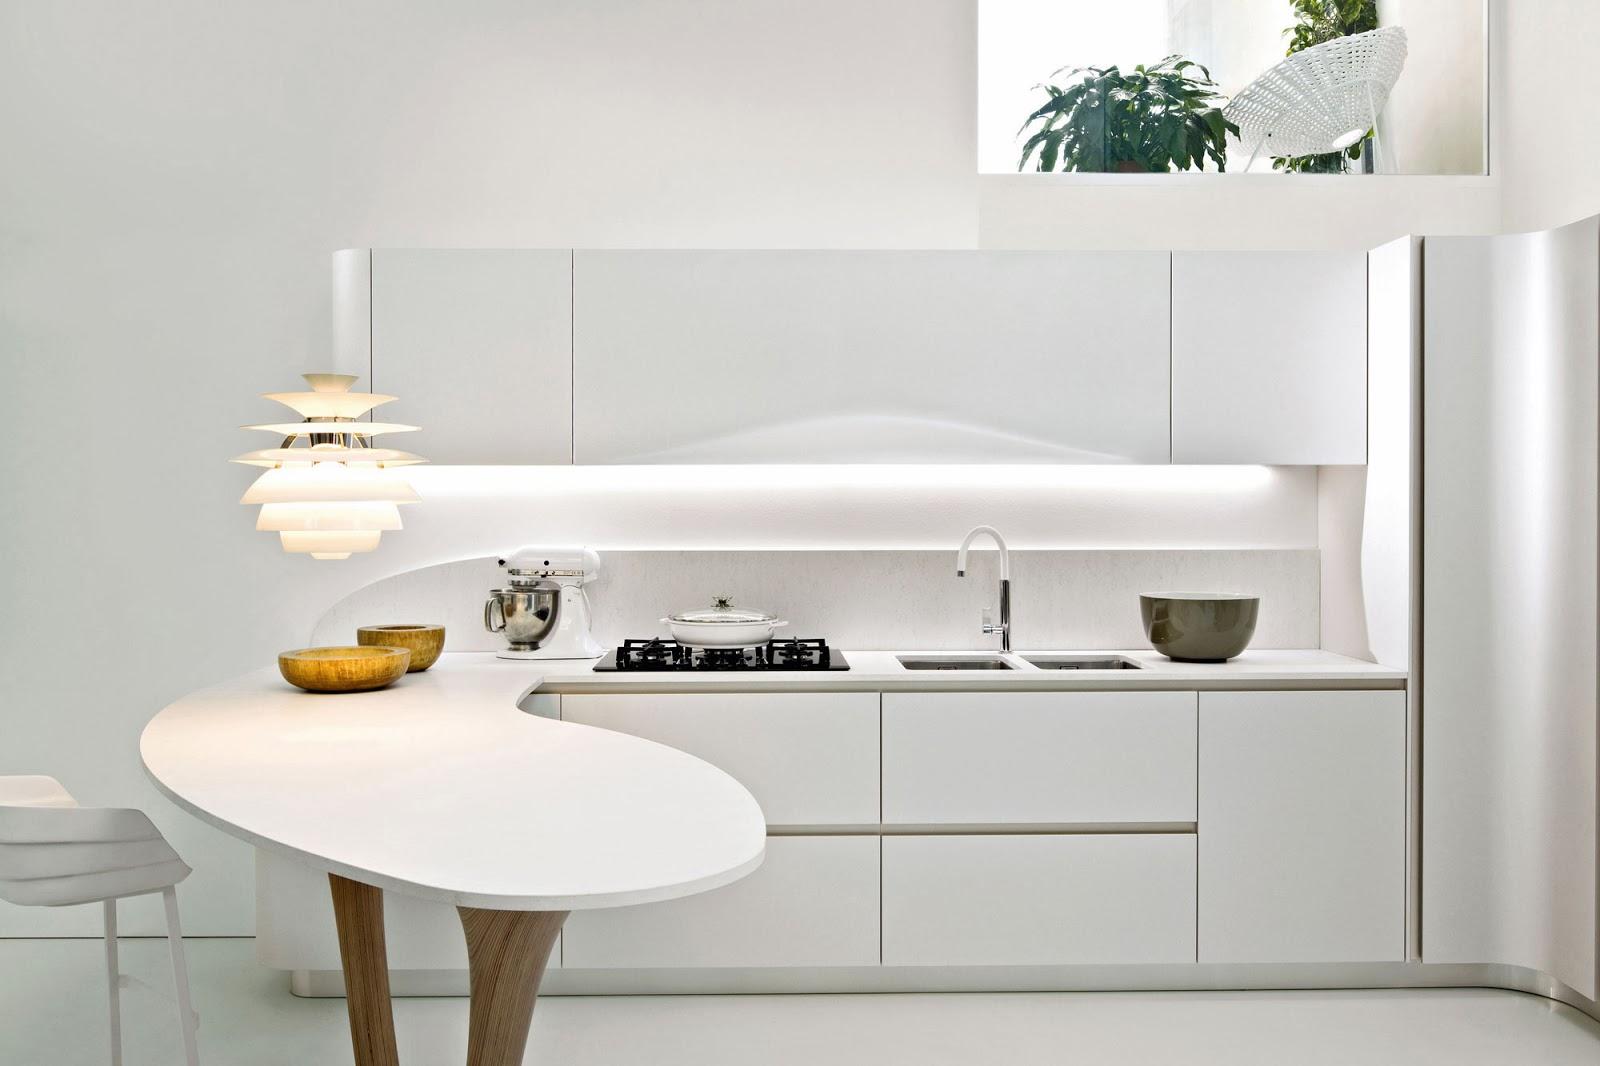 Cucine moderne con isola snaidero : cucine a scomparsa dada ...